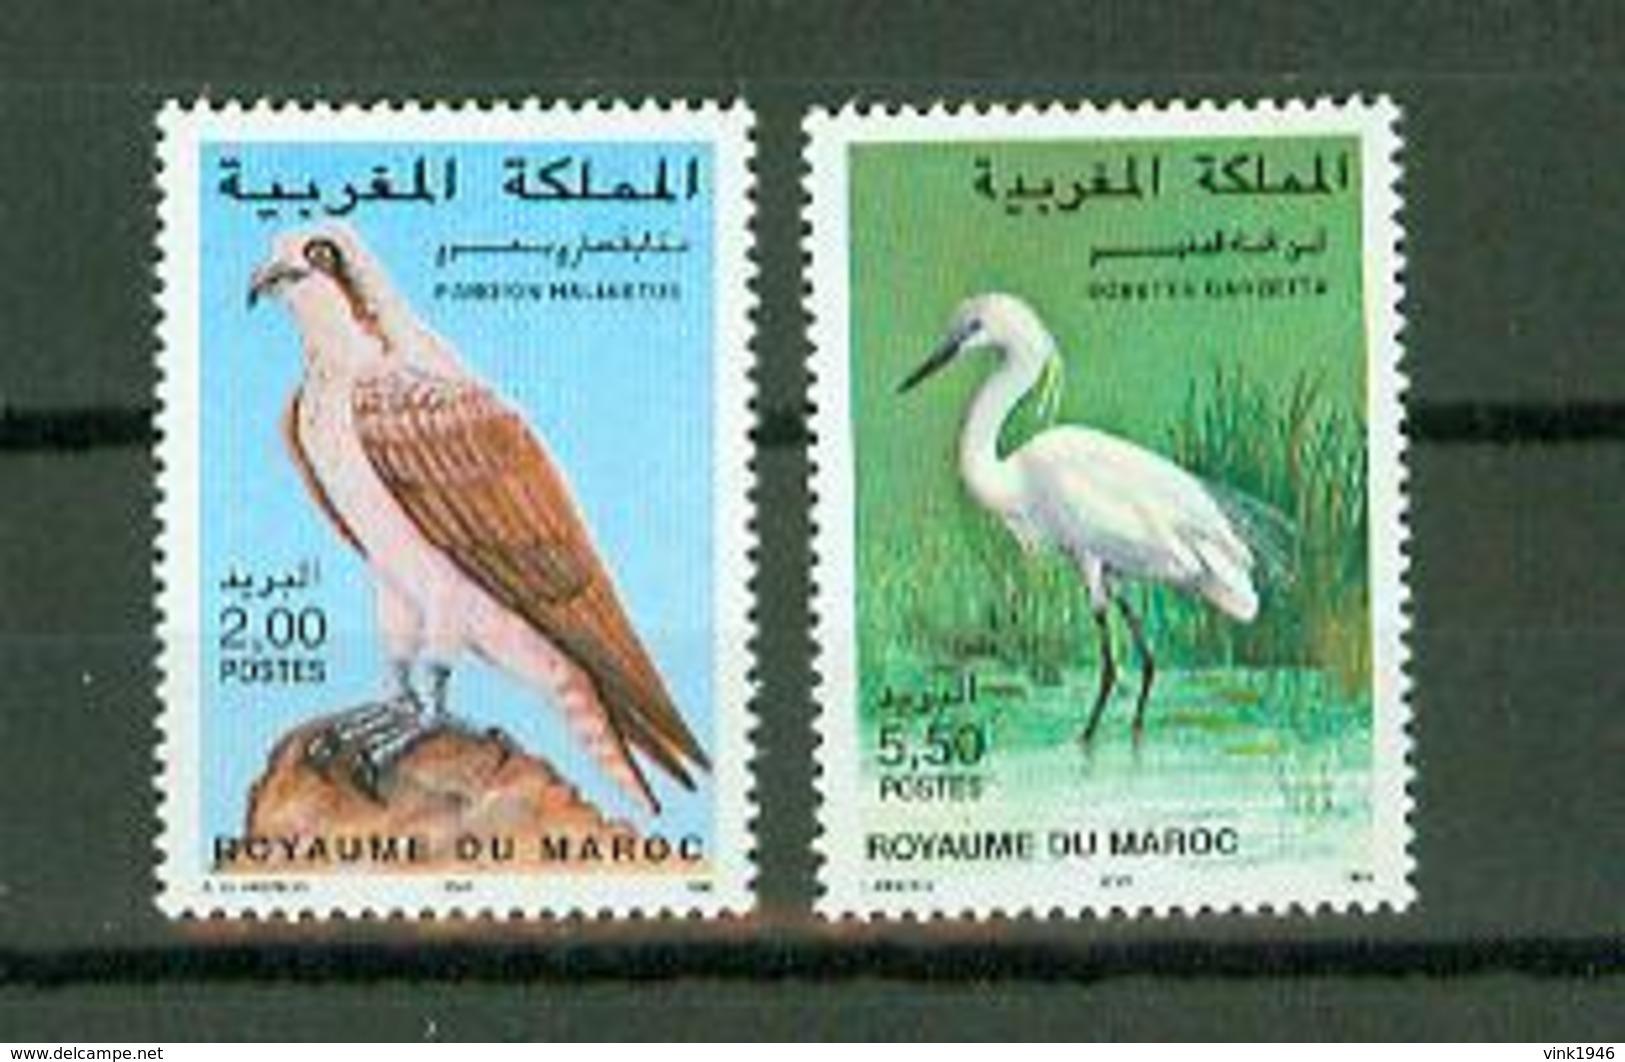 Maroc 1996,2V In Set ,birds,vogels,vögel,oiseaux,pajaros,uccelli,aves,MNH/Postfris(A3640) - Oiseaux